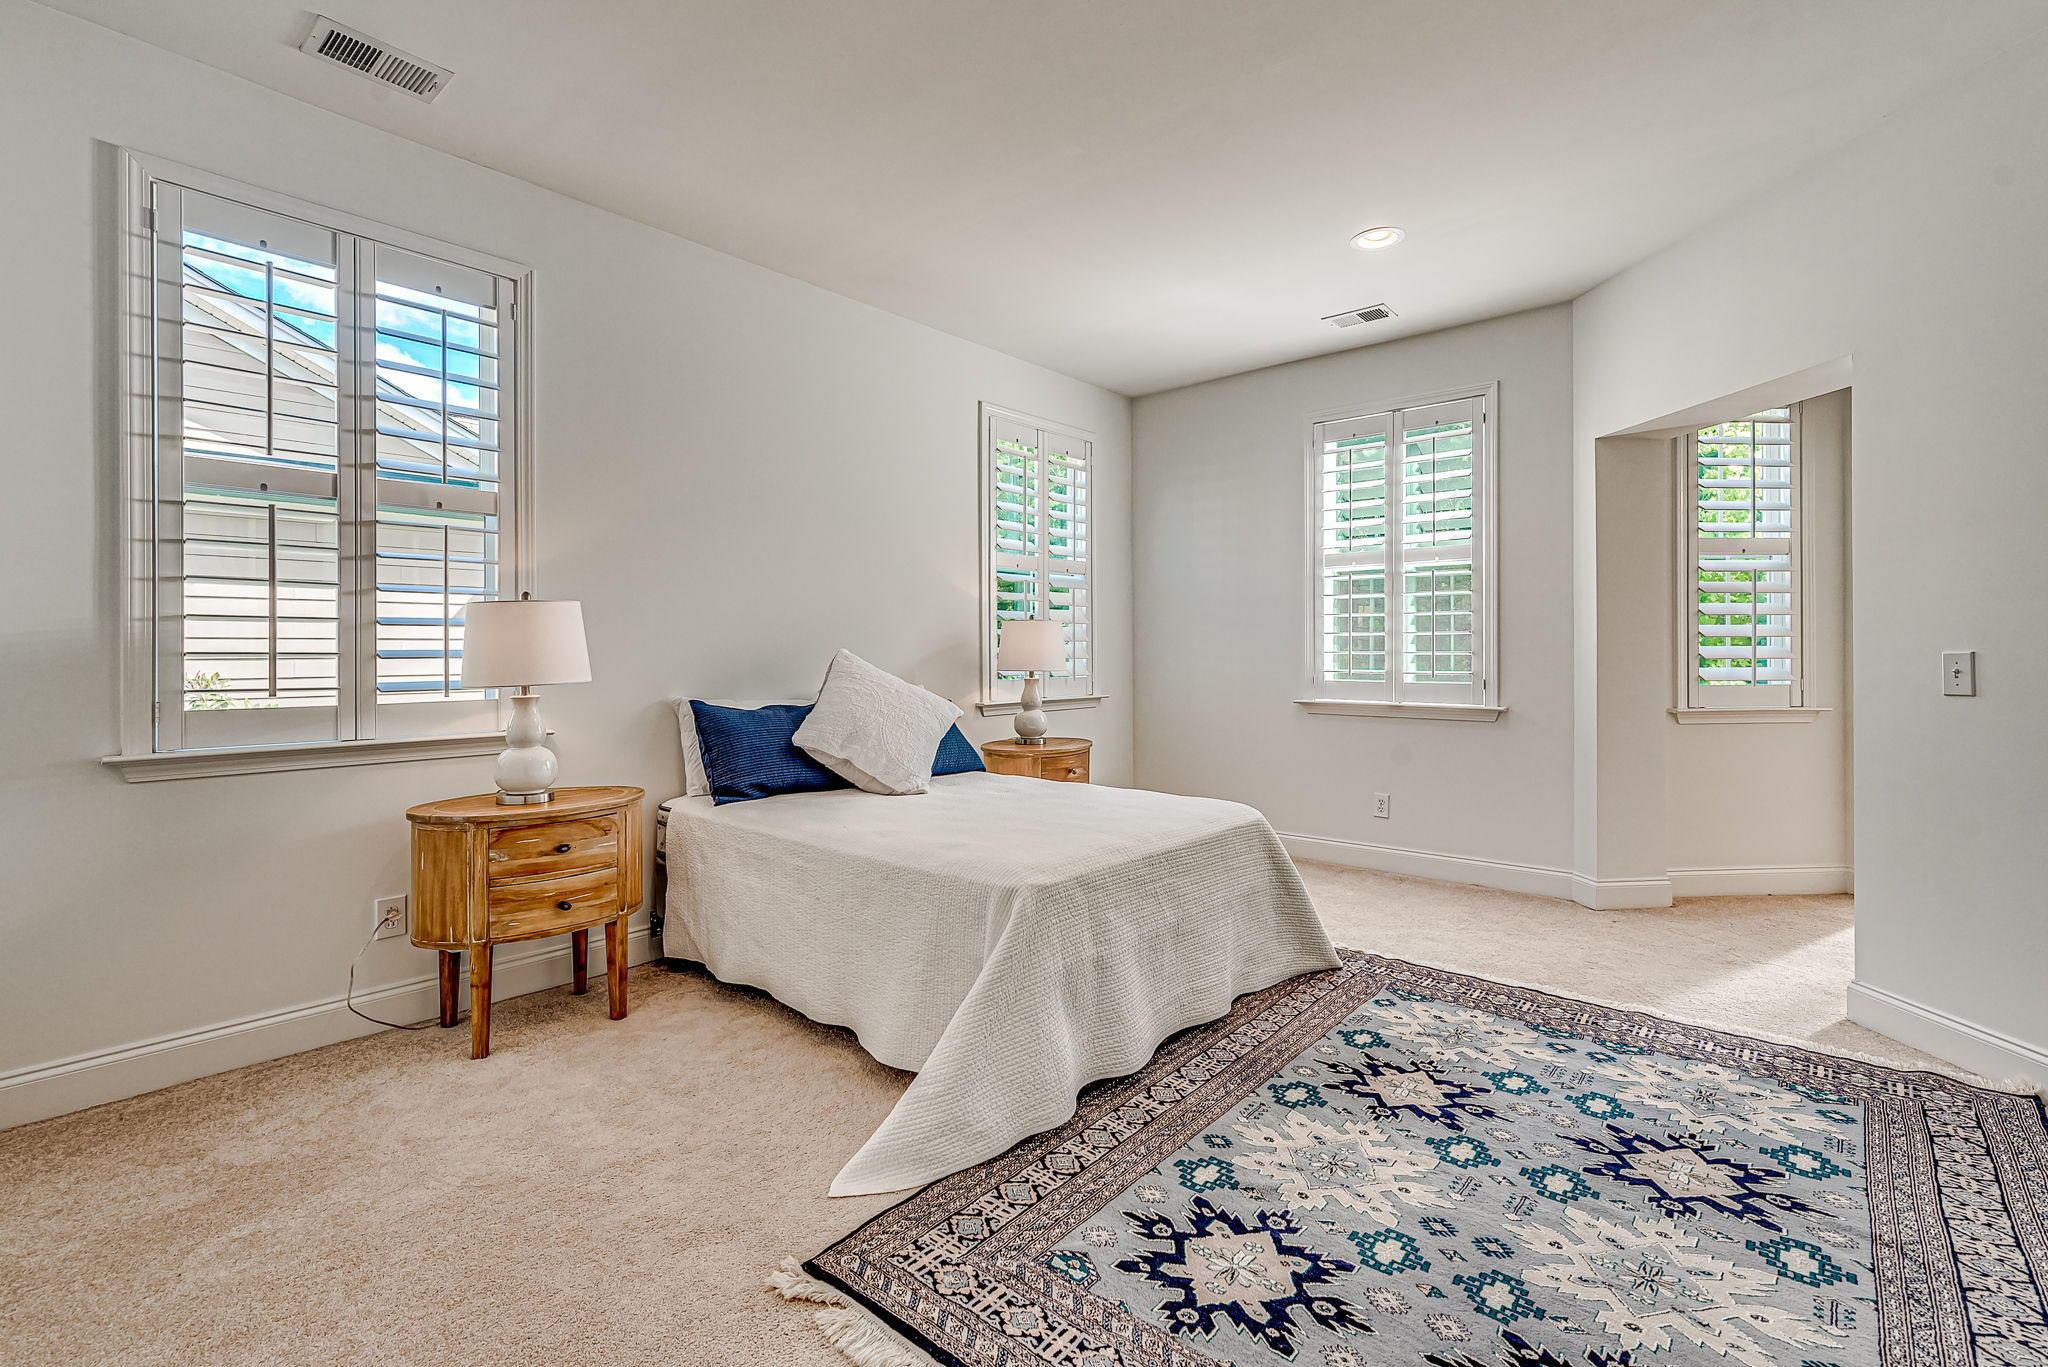 Dunes West Homes For Sale - 2476 Kings Gate, Mount Pleasant, SC - 21